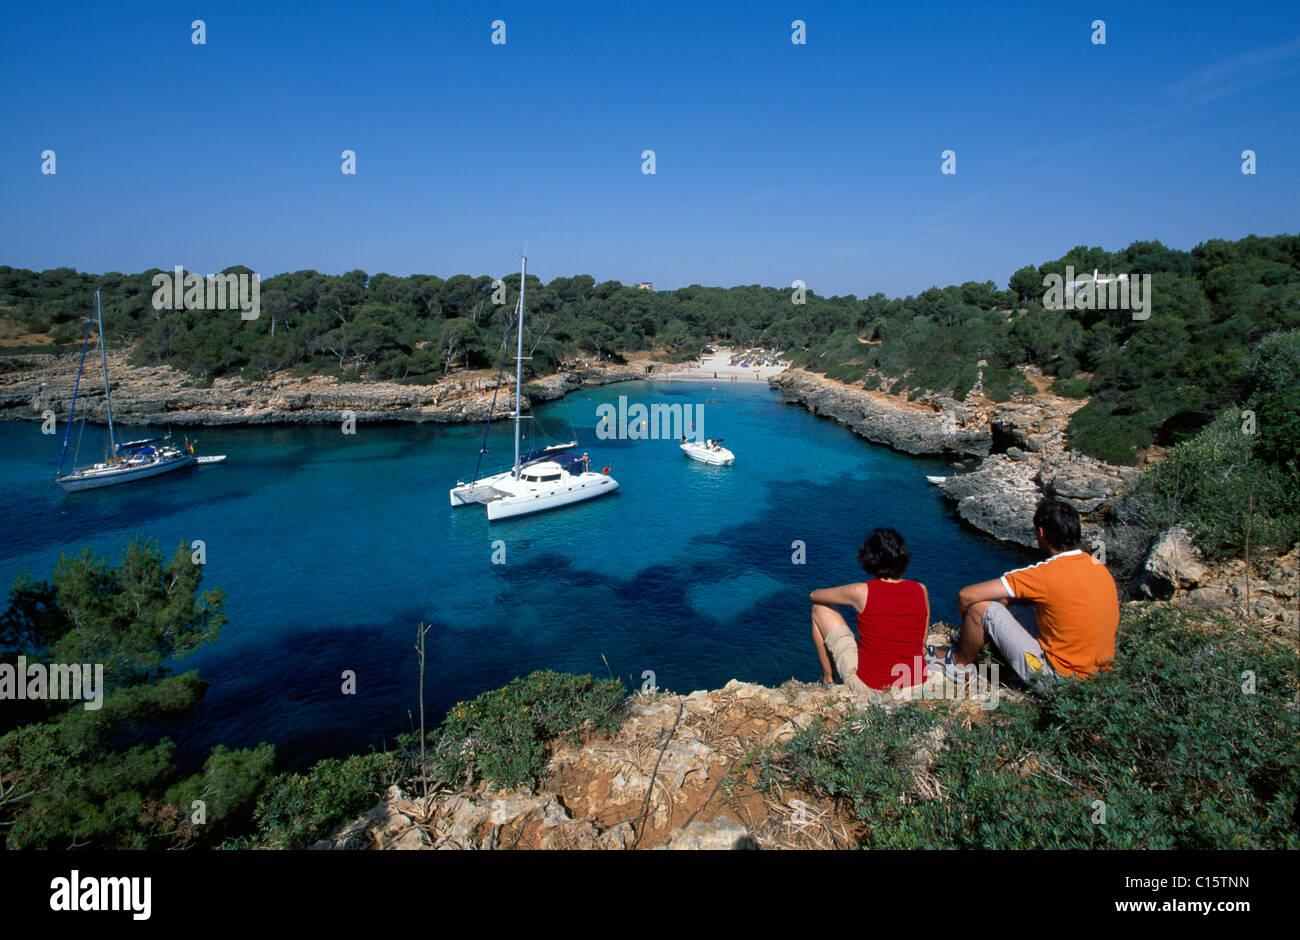 Couple sitting on rocks in the Cala Sa Nau Bay, Balearic Islands, Europe - Stock Image